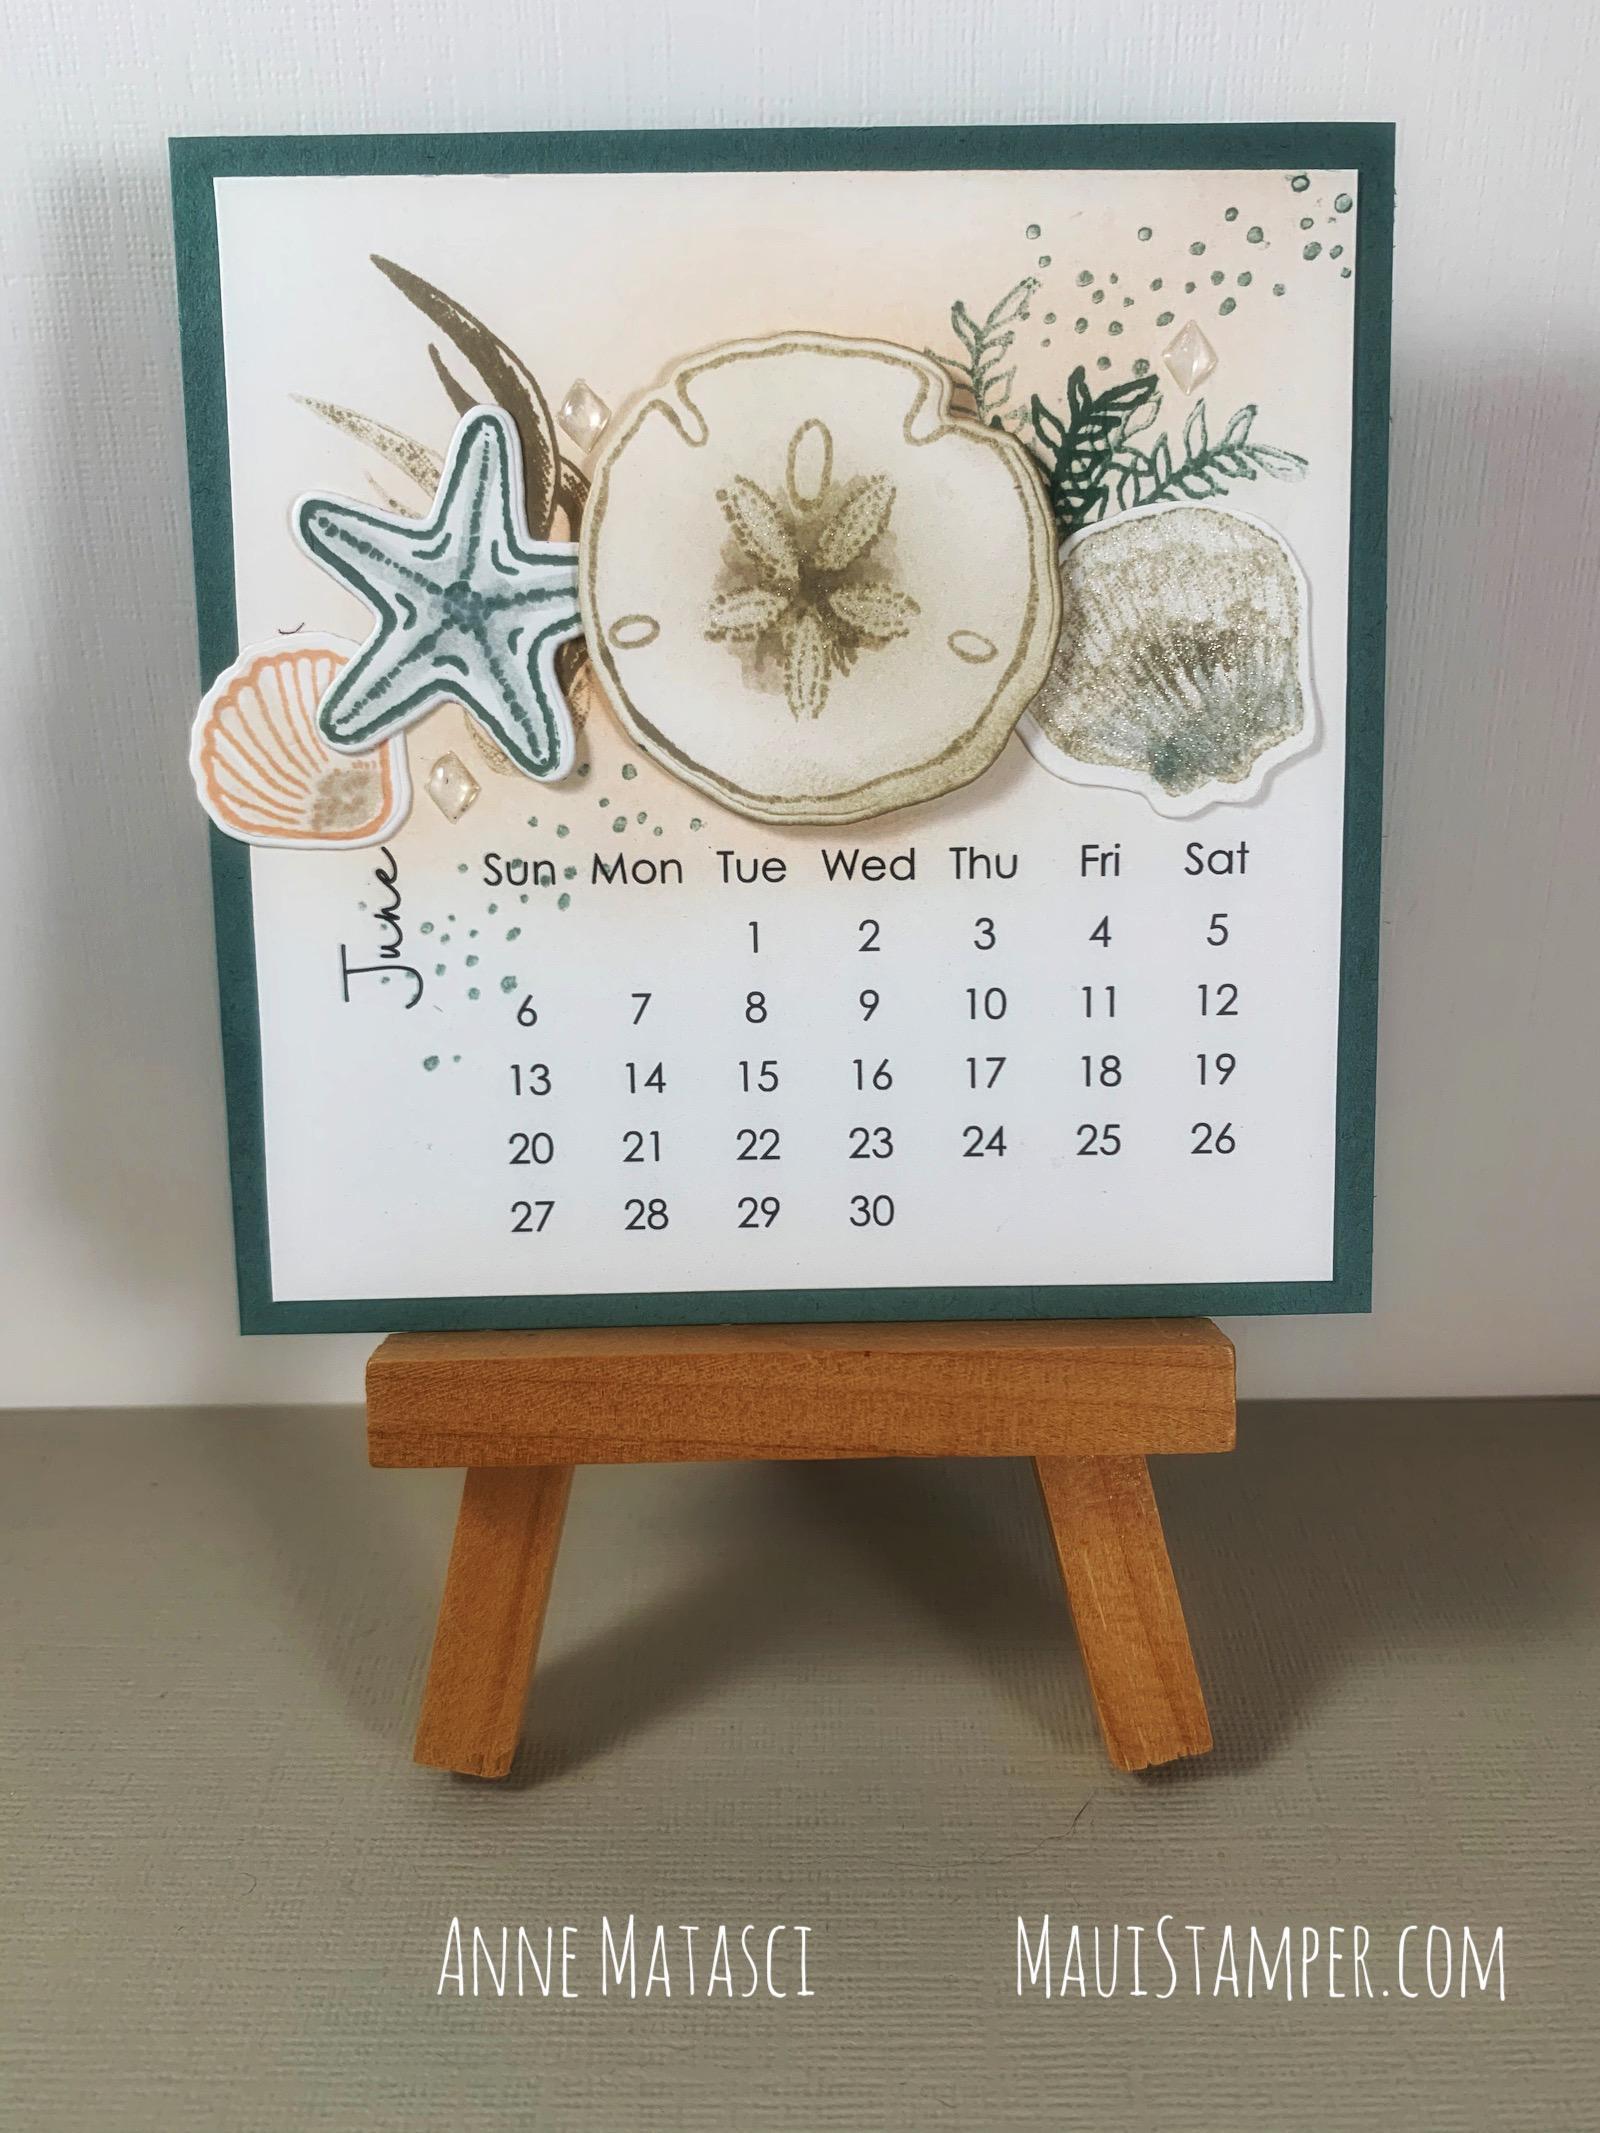 Maui Stamper Stampin Up Friends Are Like Seashells DIY Calendar June 2021